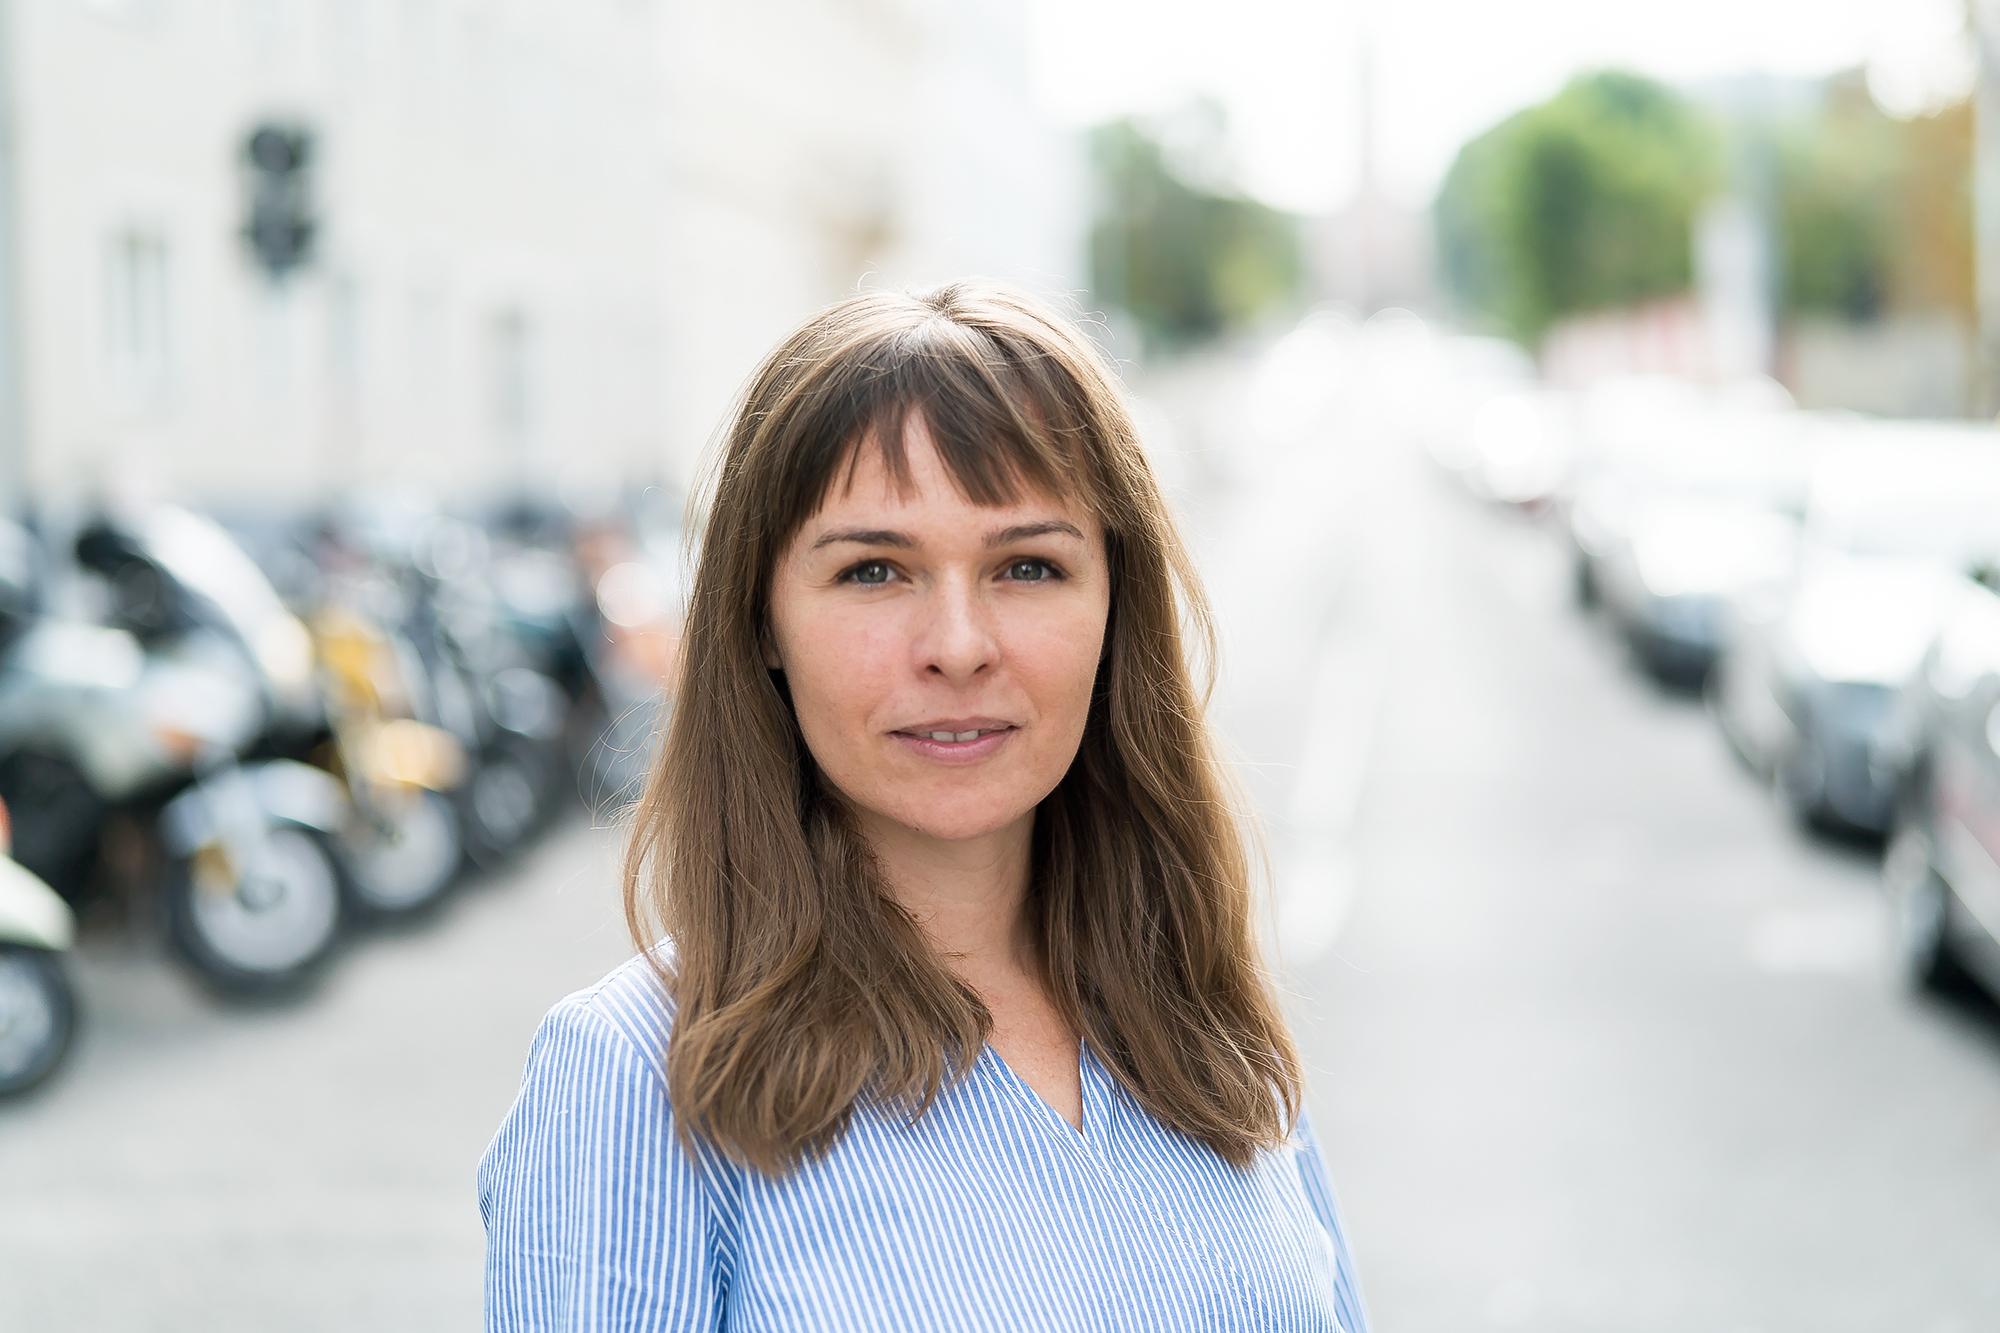 Lehrgangsleitung LIK Social Media ManagerIn: Mirela Jasic